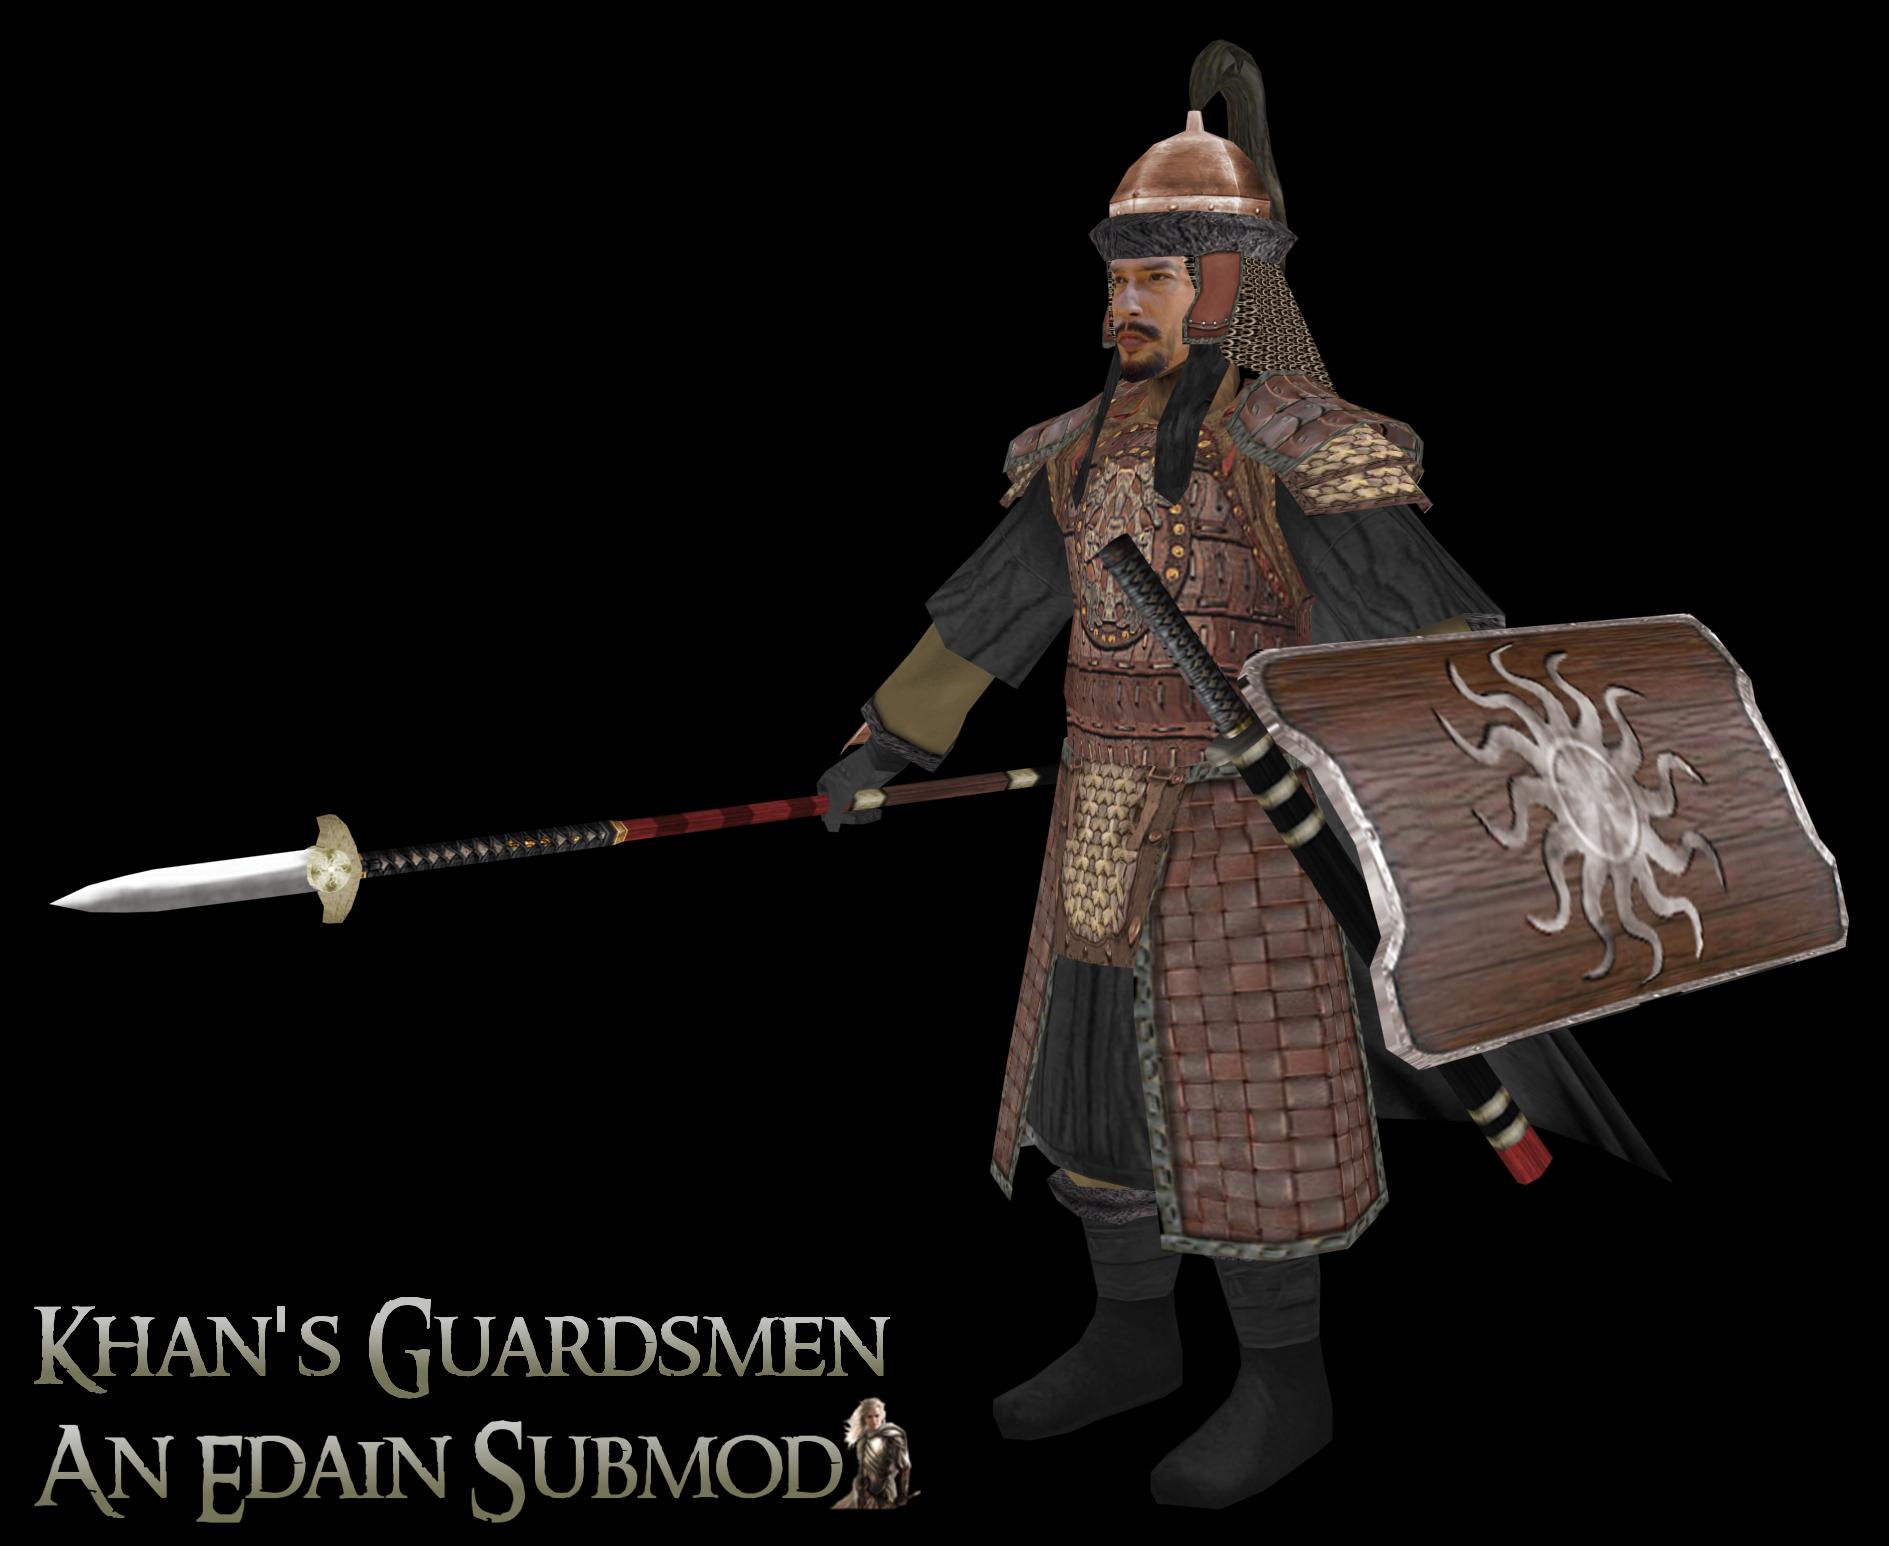 Khan's Guardsmen